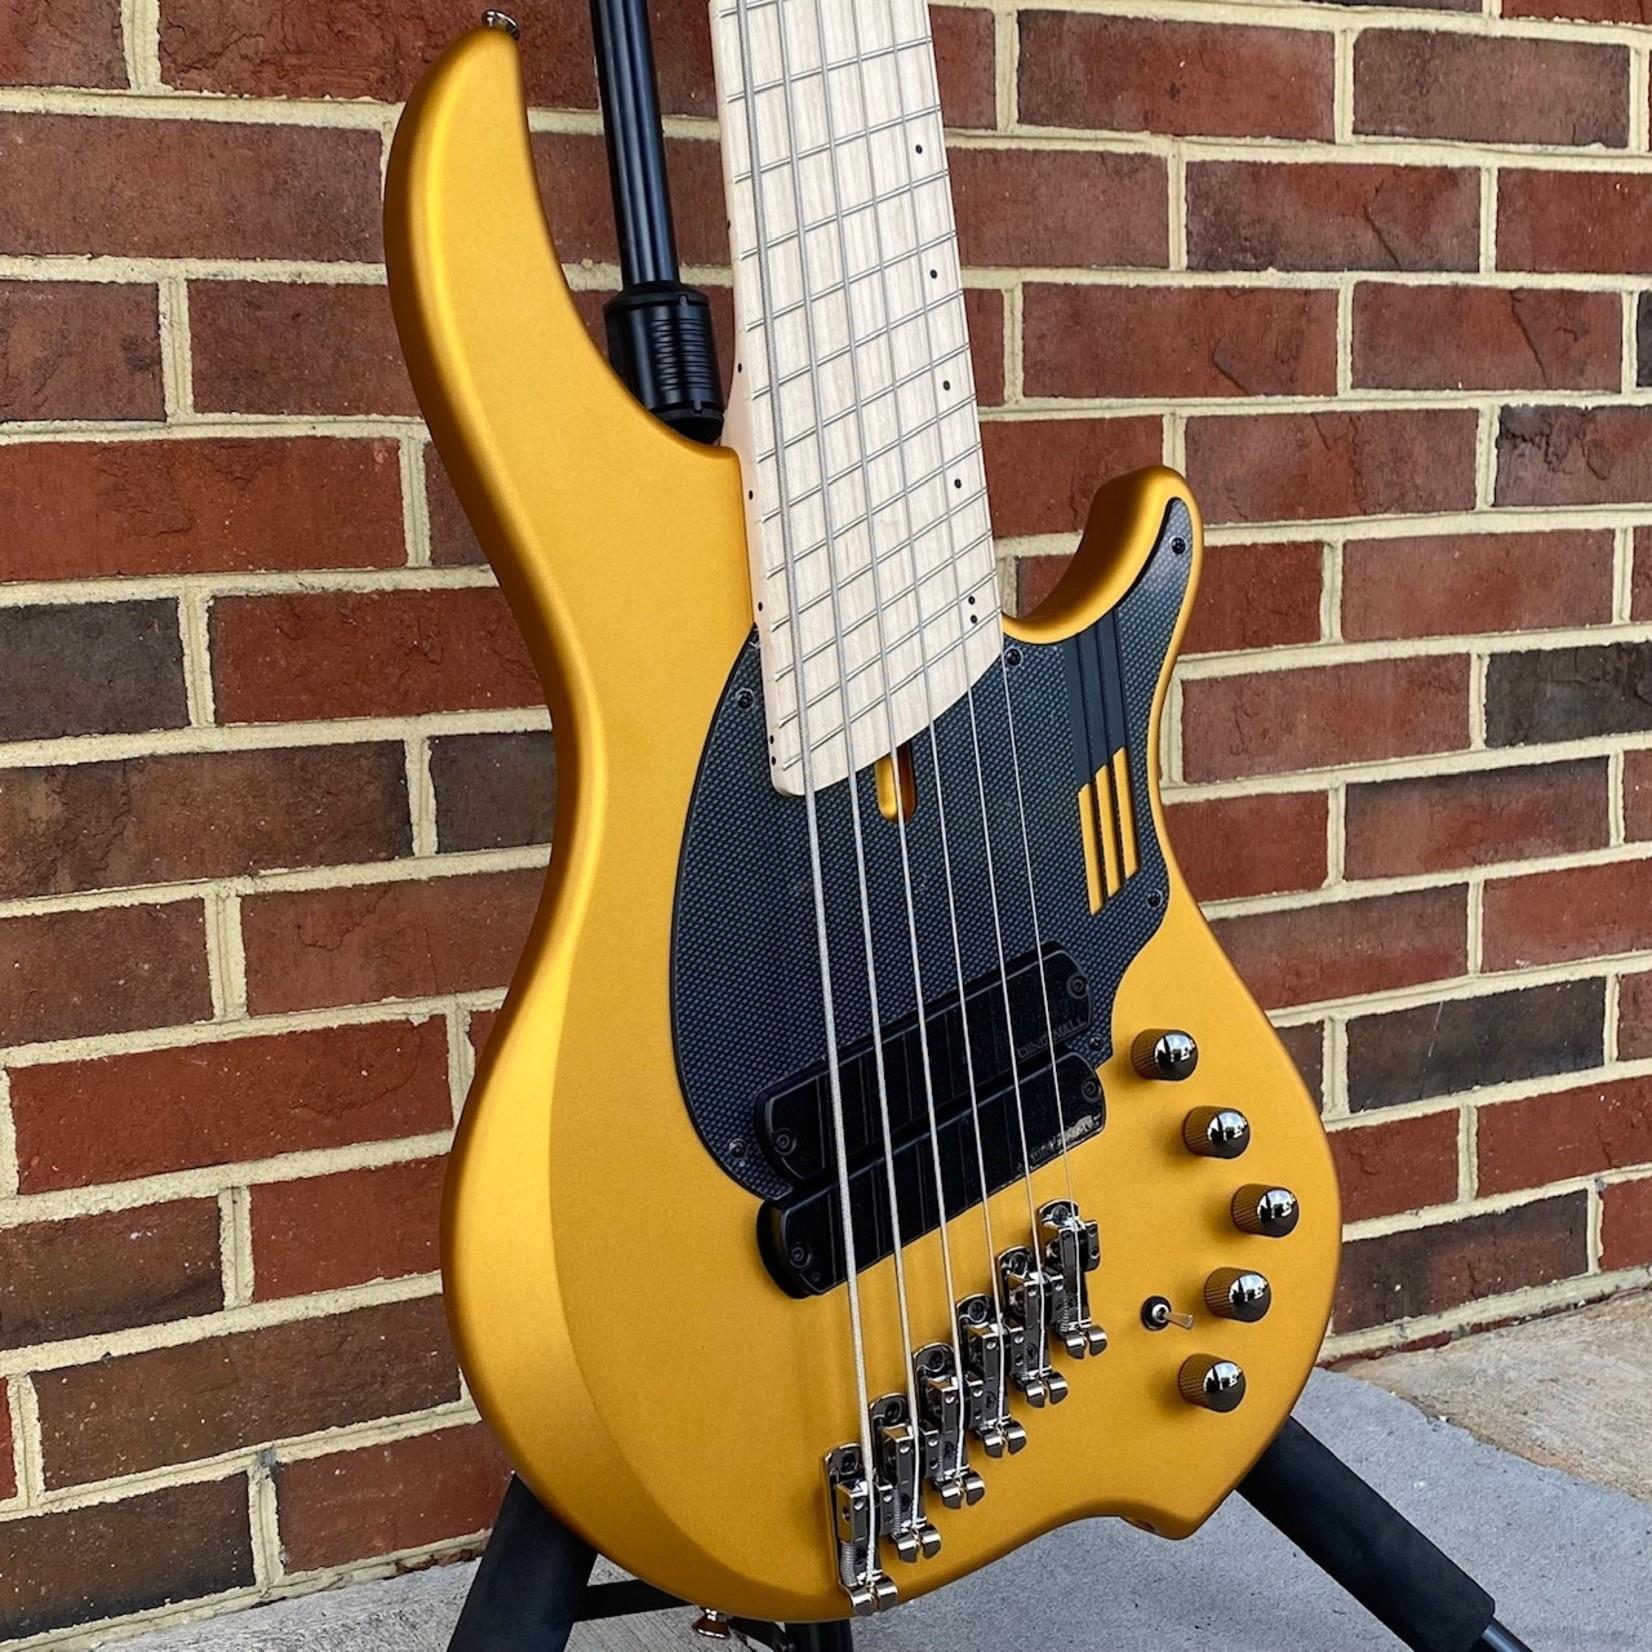 Dingwall Dingwall NG2 6-String, Matte Gold Metallic, Maple Fretboard, Matching Headstock, Dingwall Gig Bag, SN# 9647